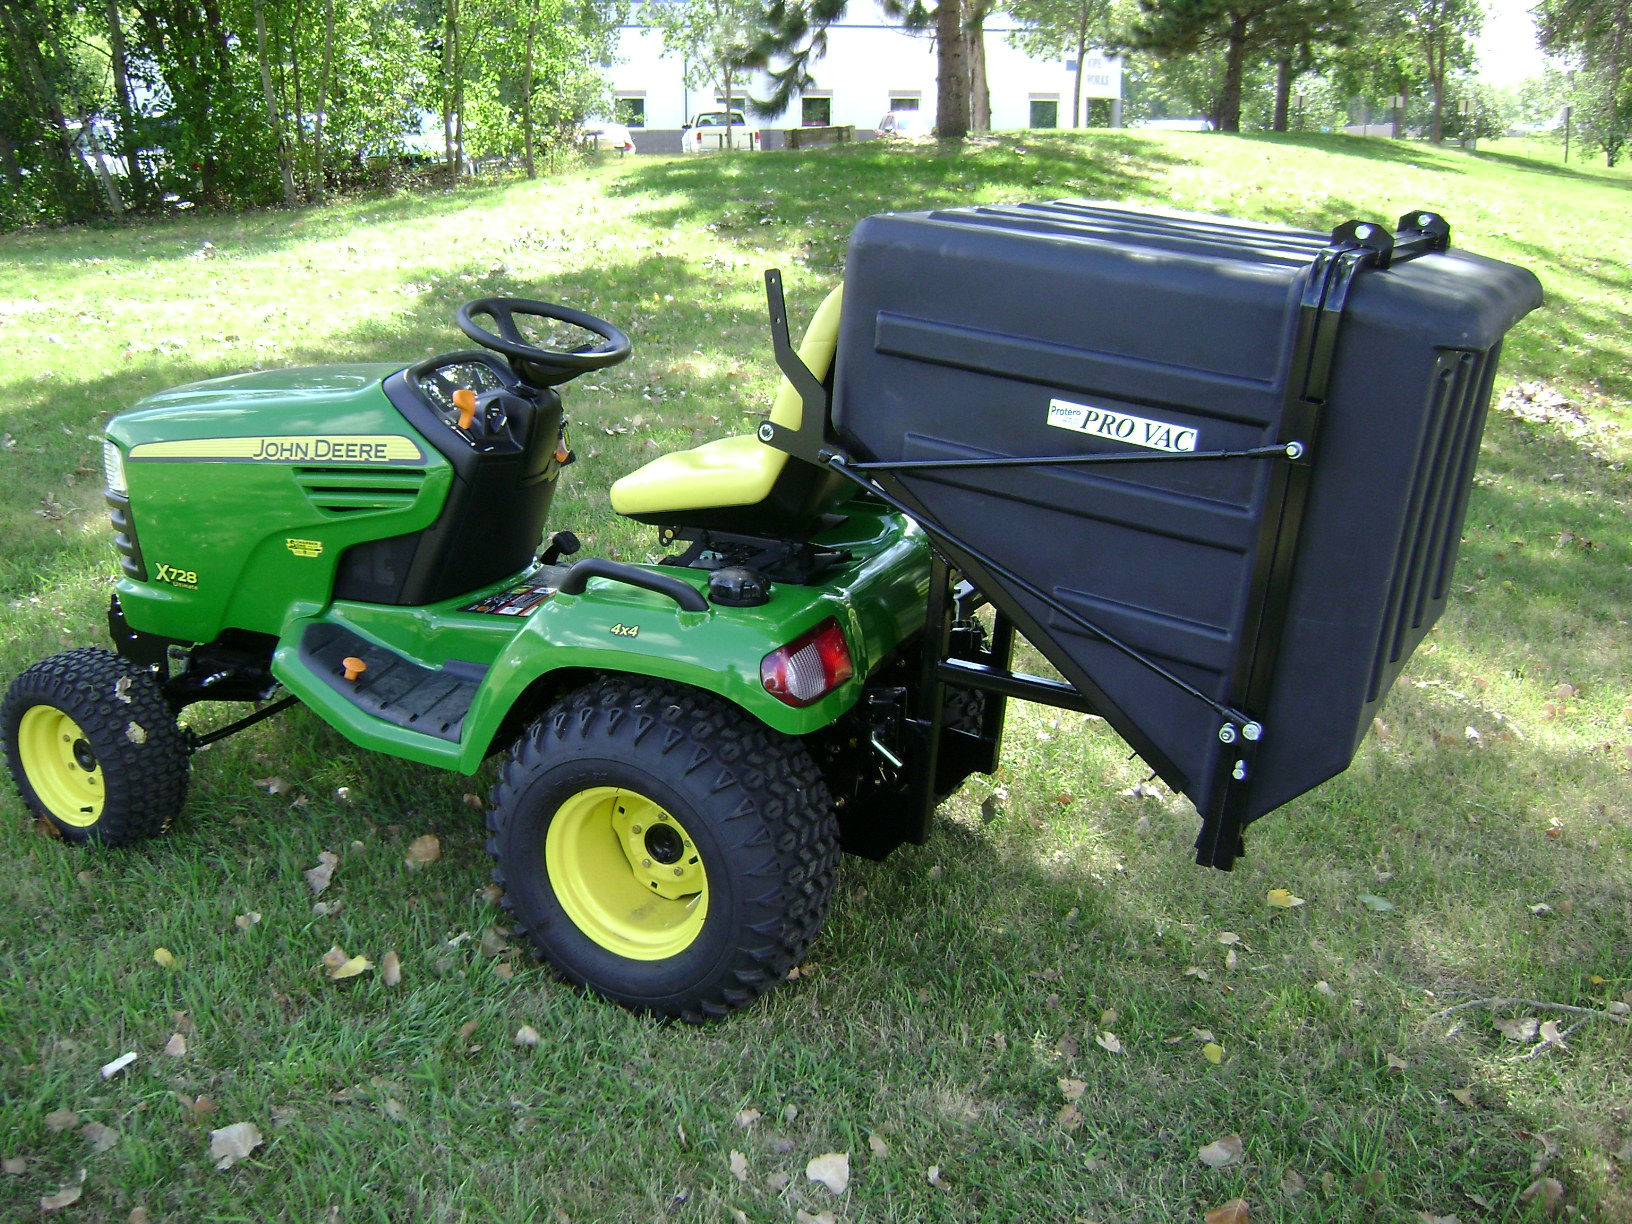 John Deere Lawn Vacuum Systems